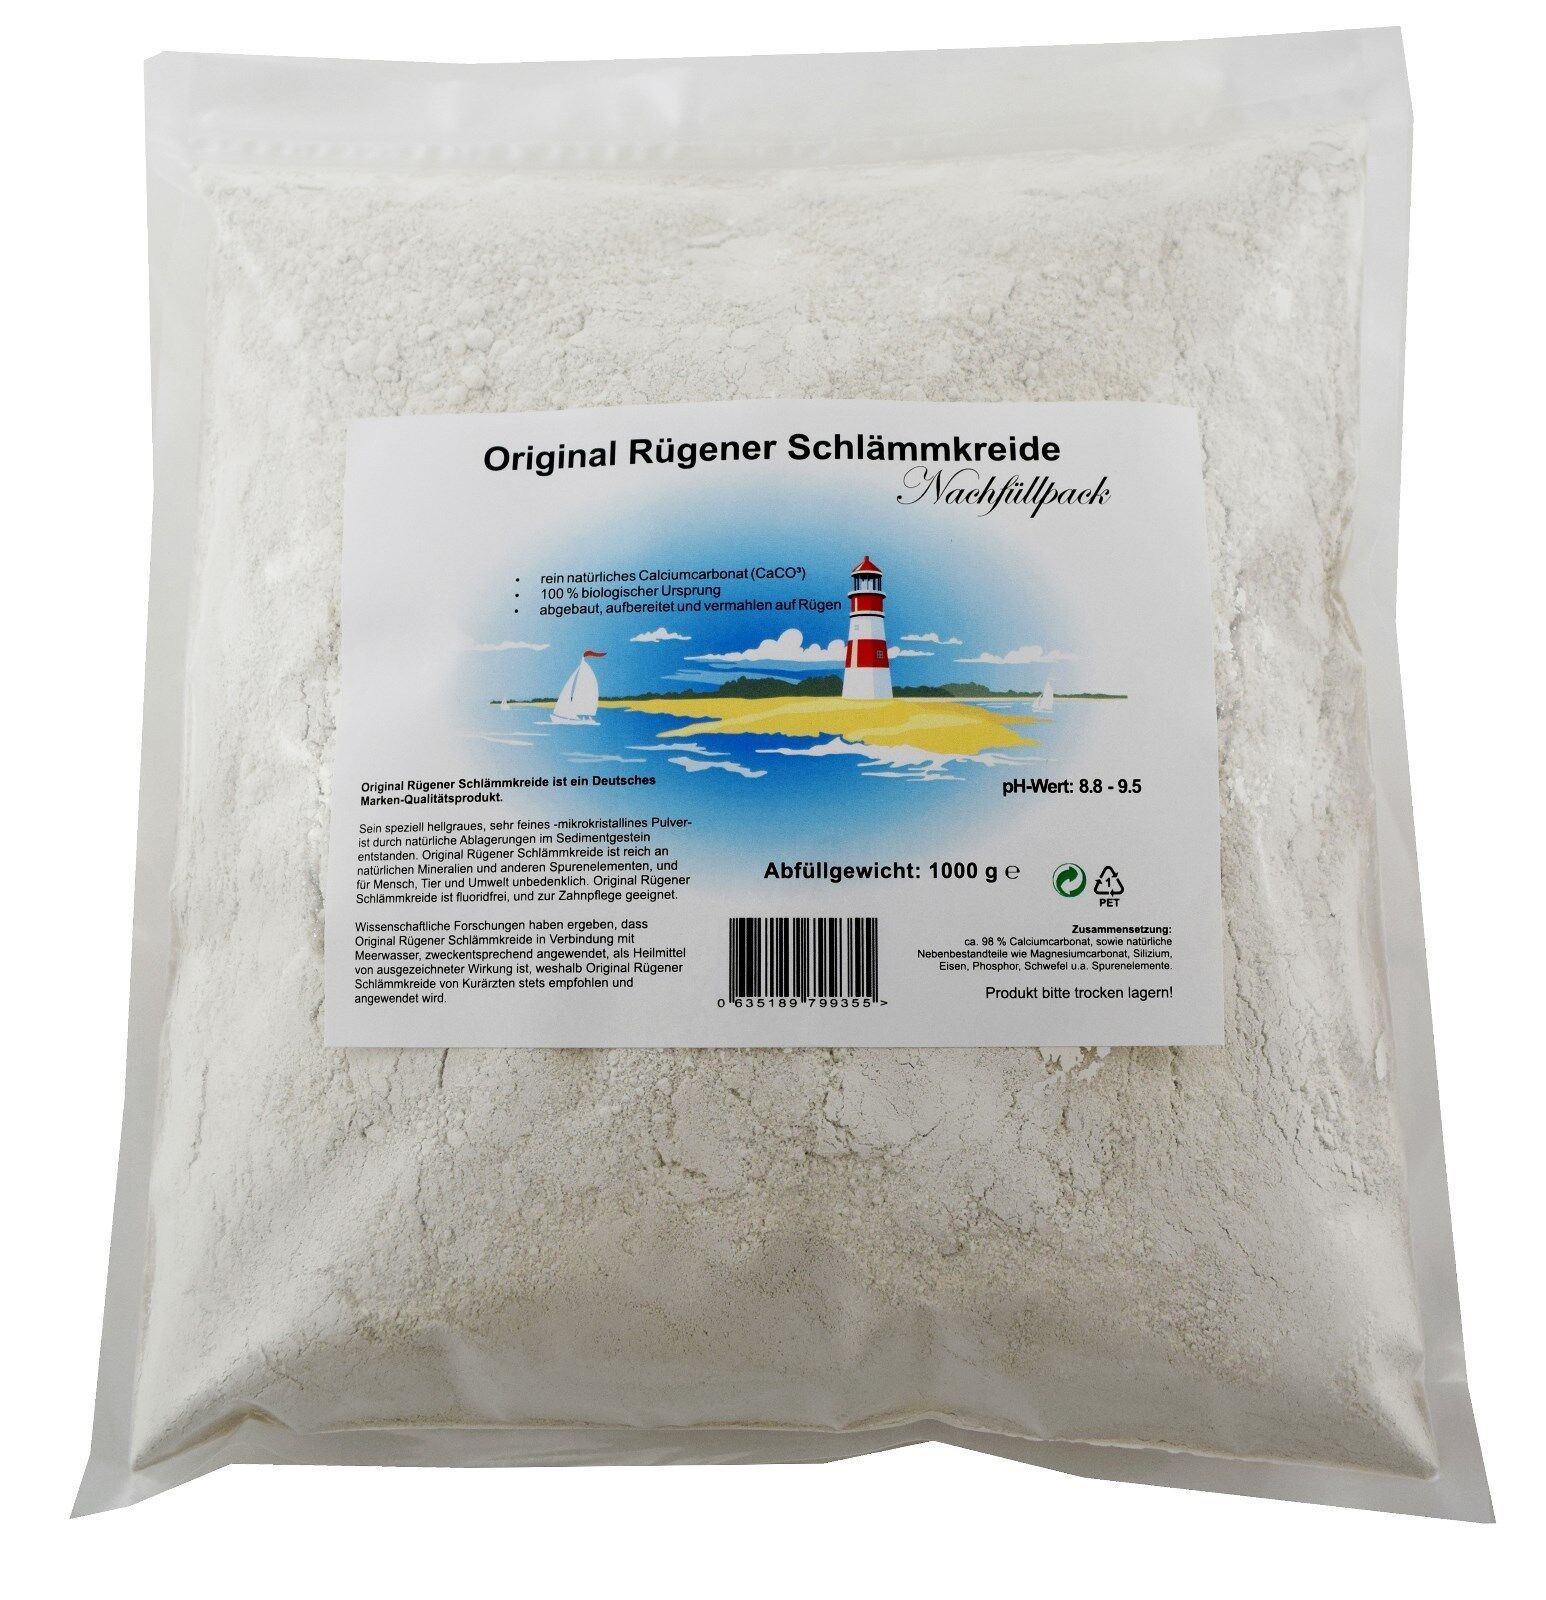 Original Rügener Schlämmkreide / 1000g Nachfüllpack / 100% Naturprodukt